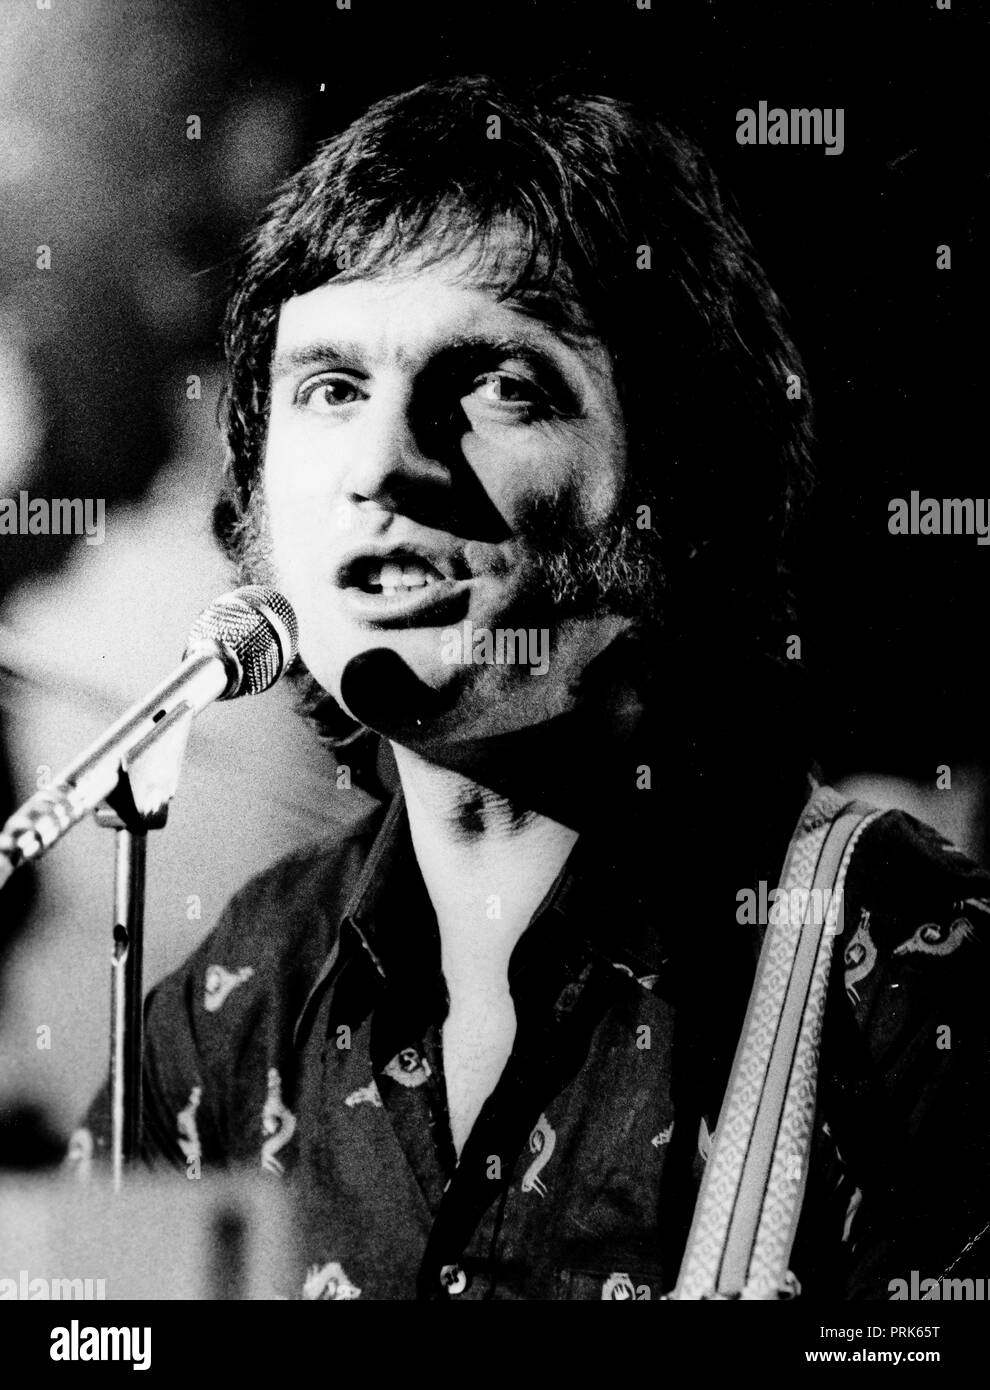 ralph mctell, 1975 - Stock Image